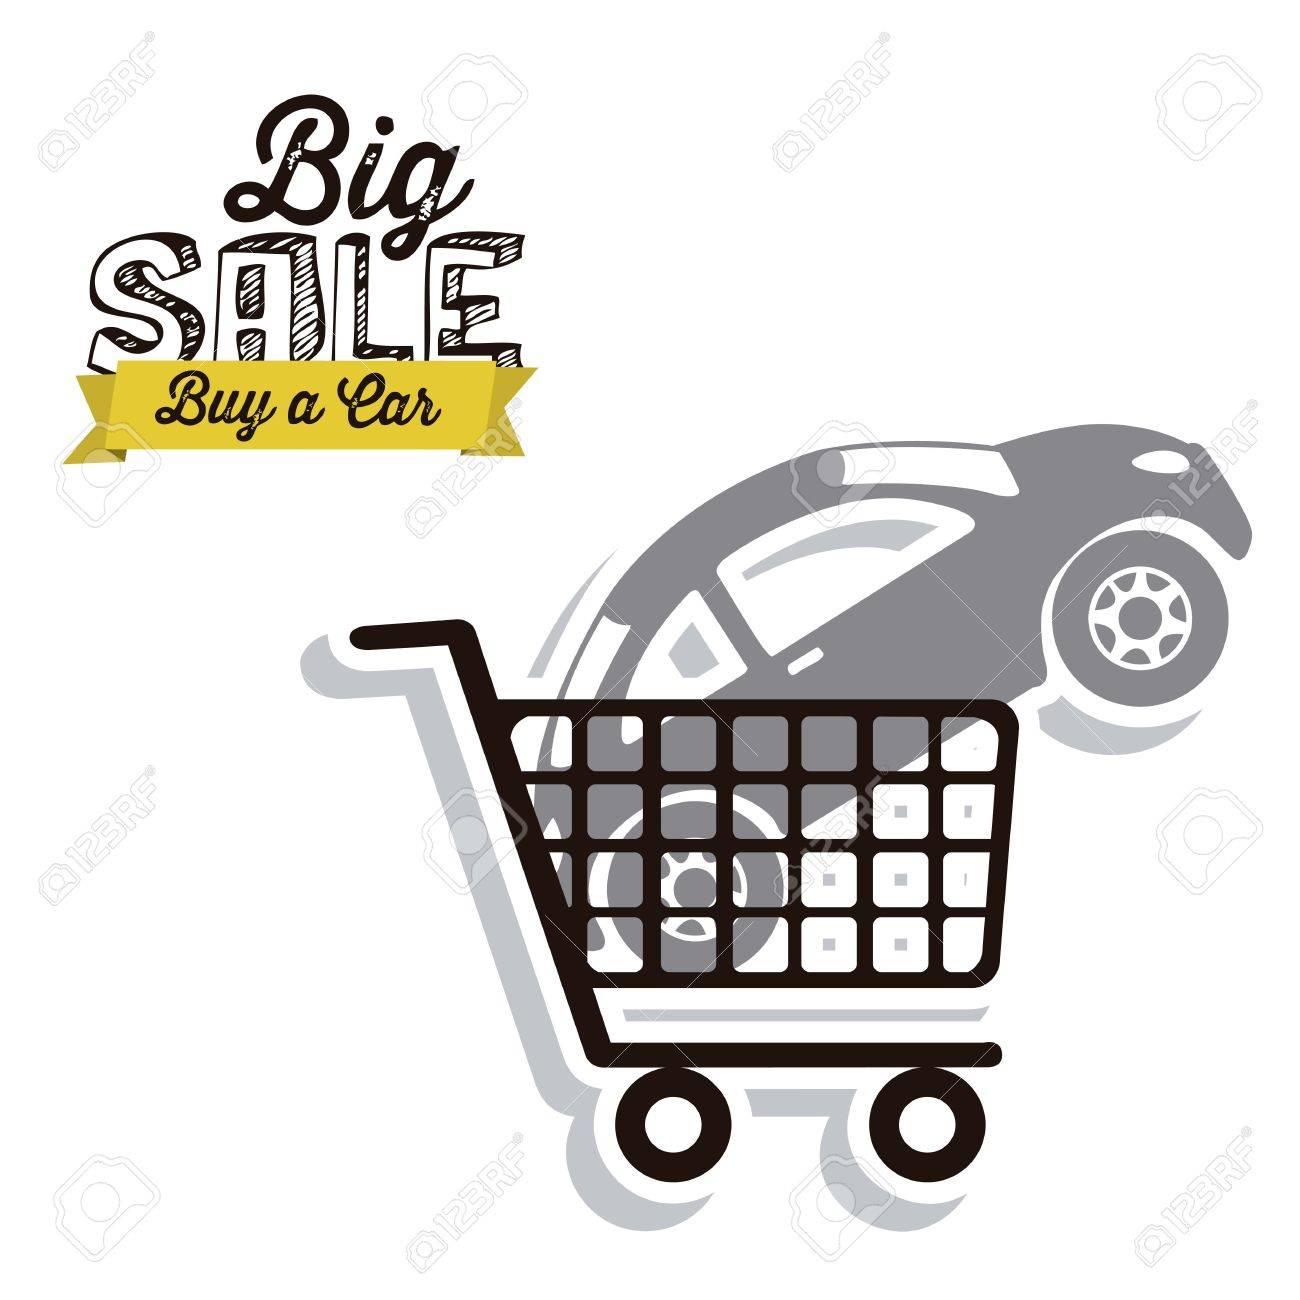 Illustration of  Big Sale label, Buy a car, vector illustration Stock Vector - 17614533